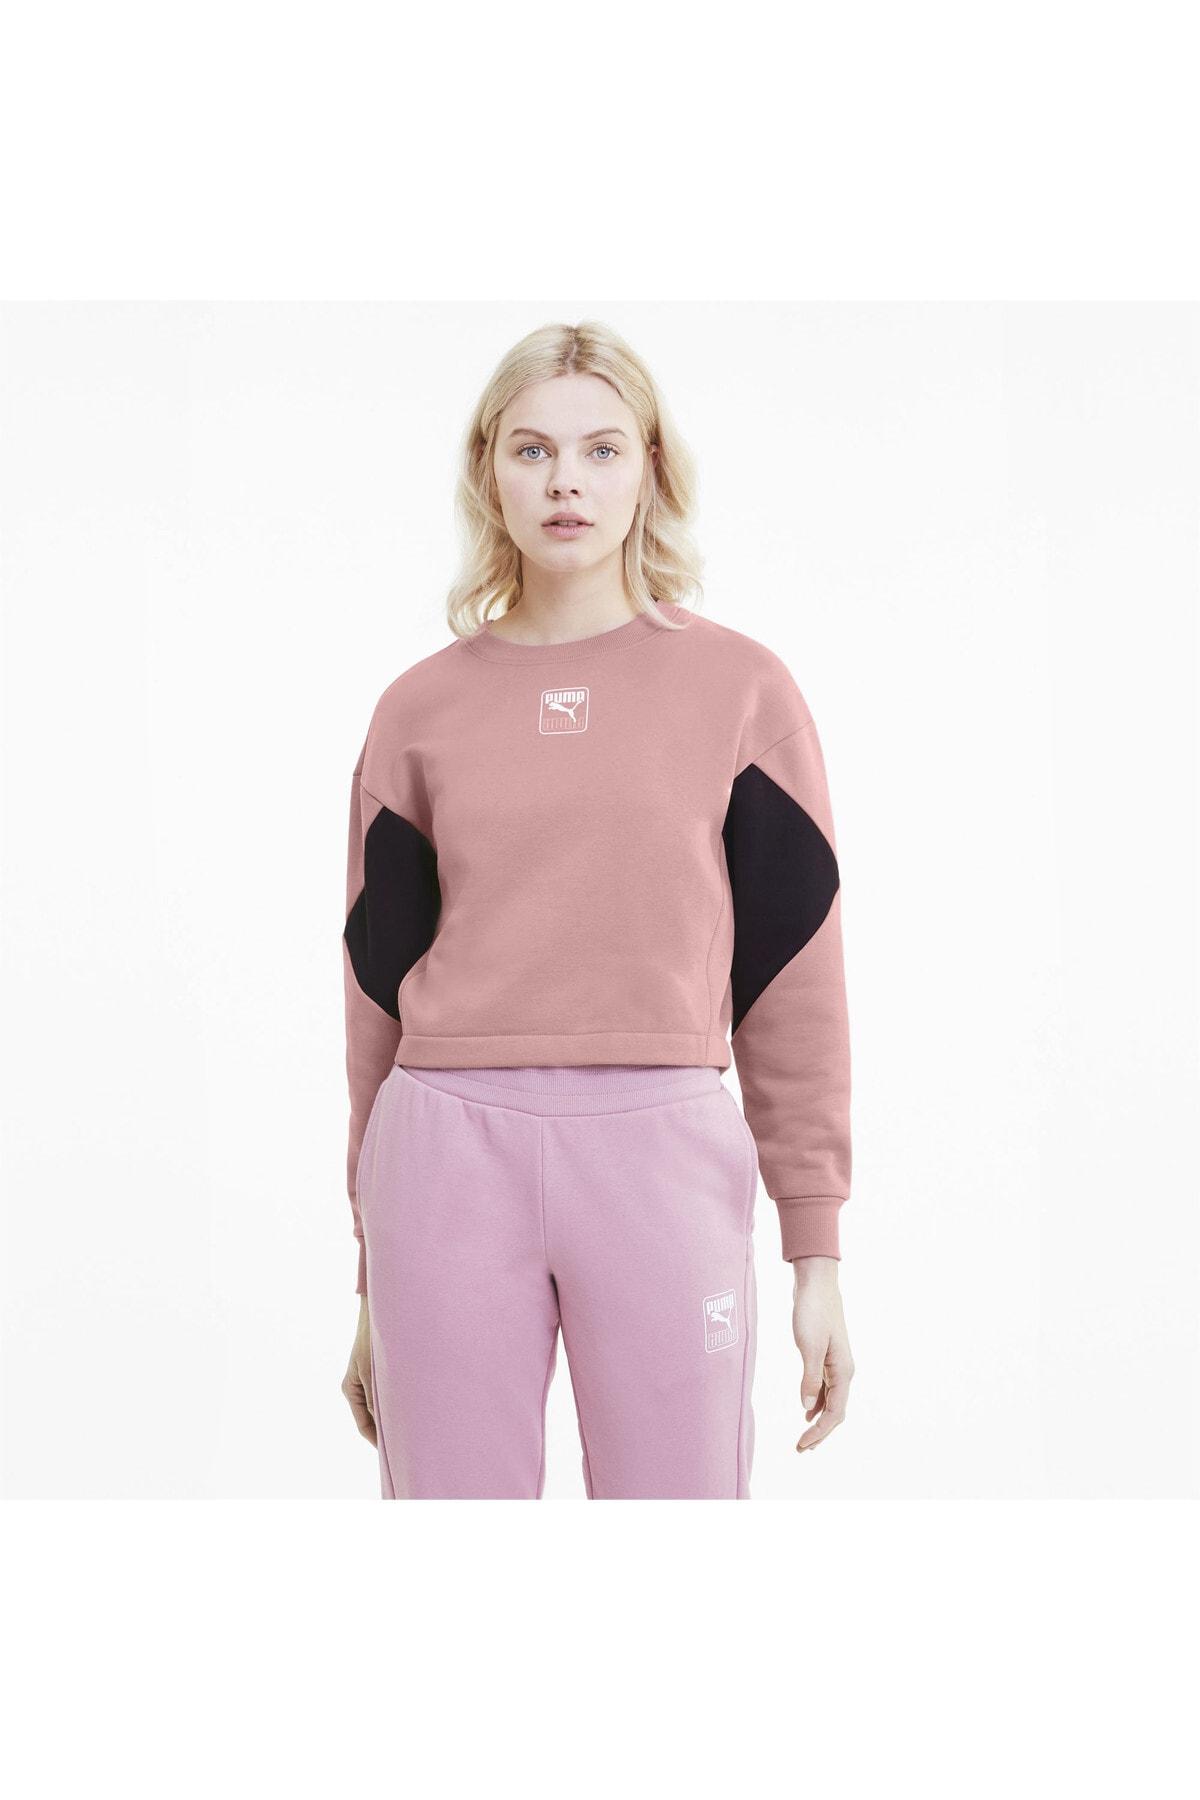 Puma Kadın Spor Sweatshirt - Rebel - 58356016